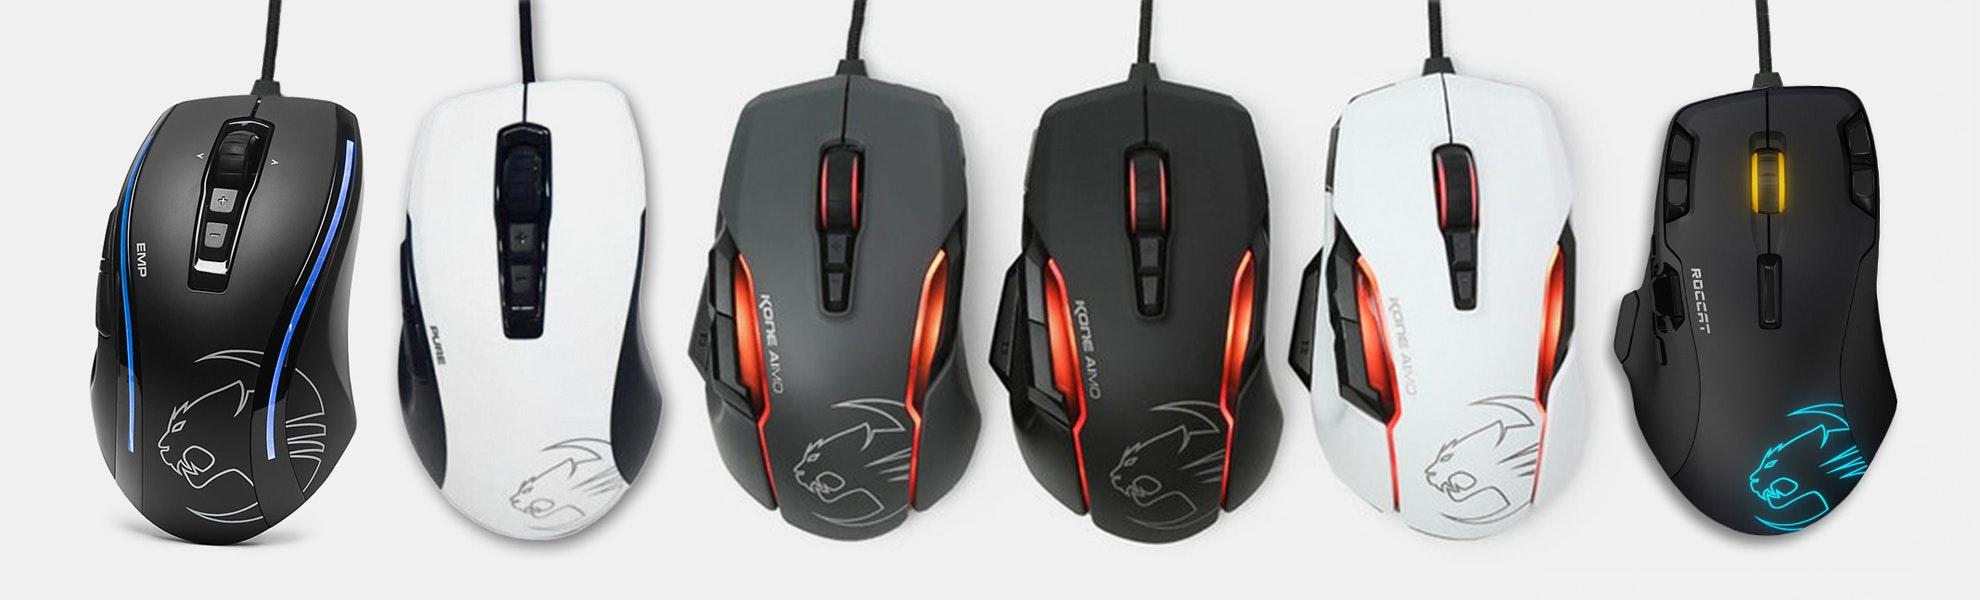 Roccat Owl-Eye Optical Gaming Mice